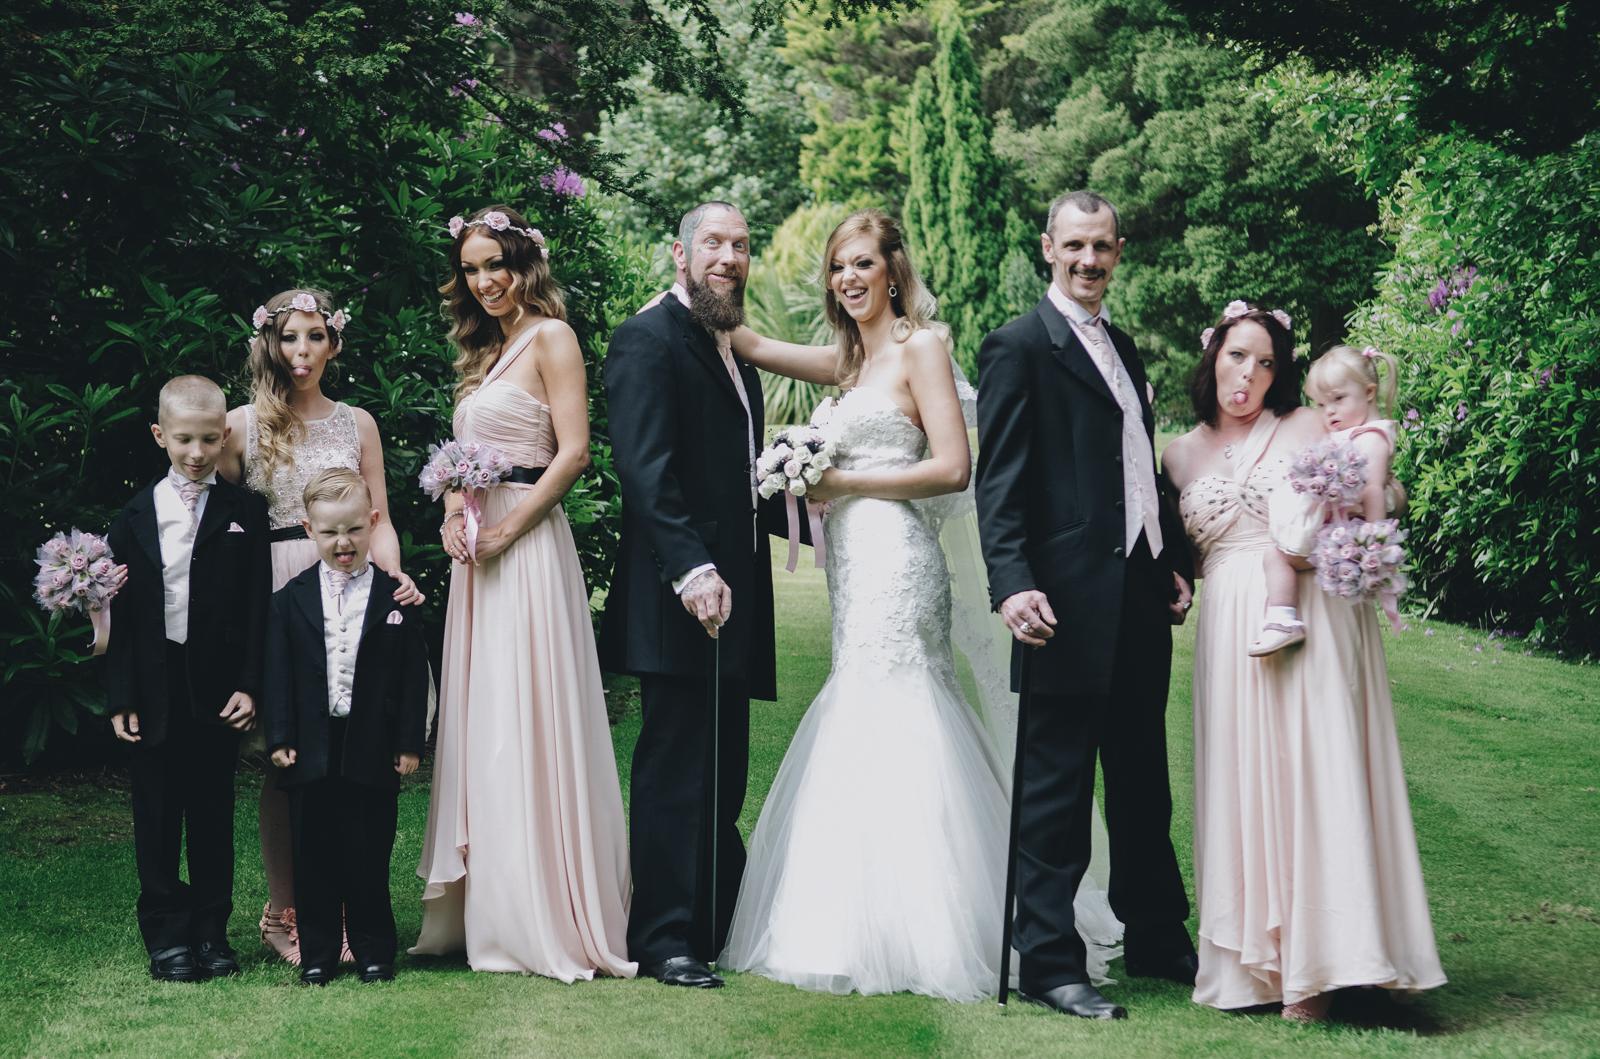 Alternative-North-West-Manchester-Wedding-Photography-Astley-bank-Wedding-skull-cake-tattooed-groom-30.jpg